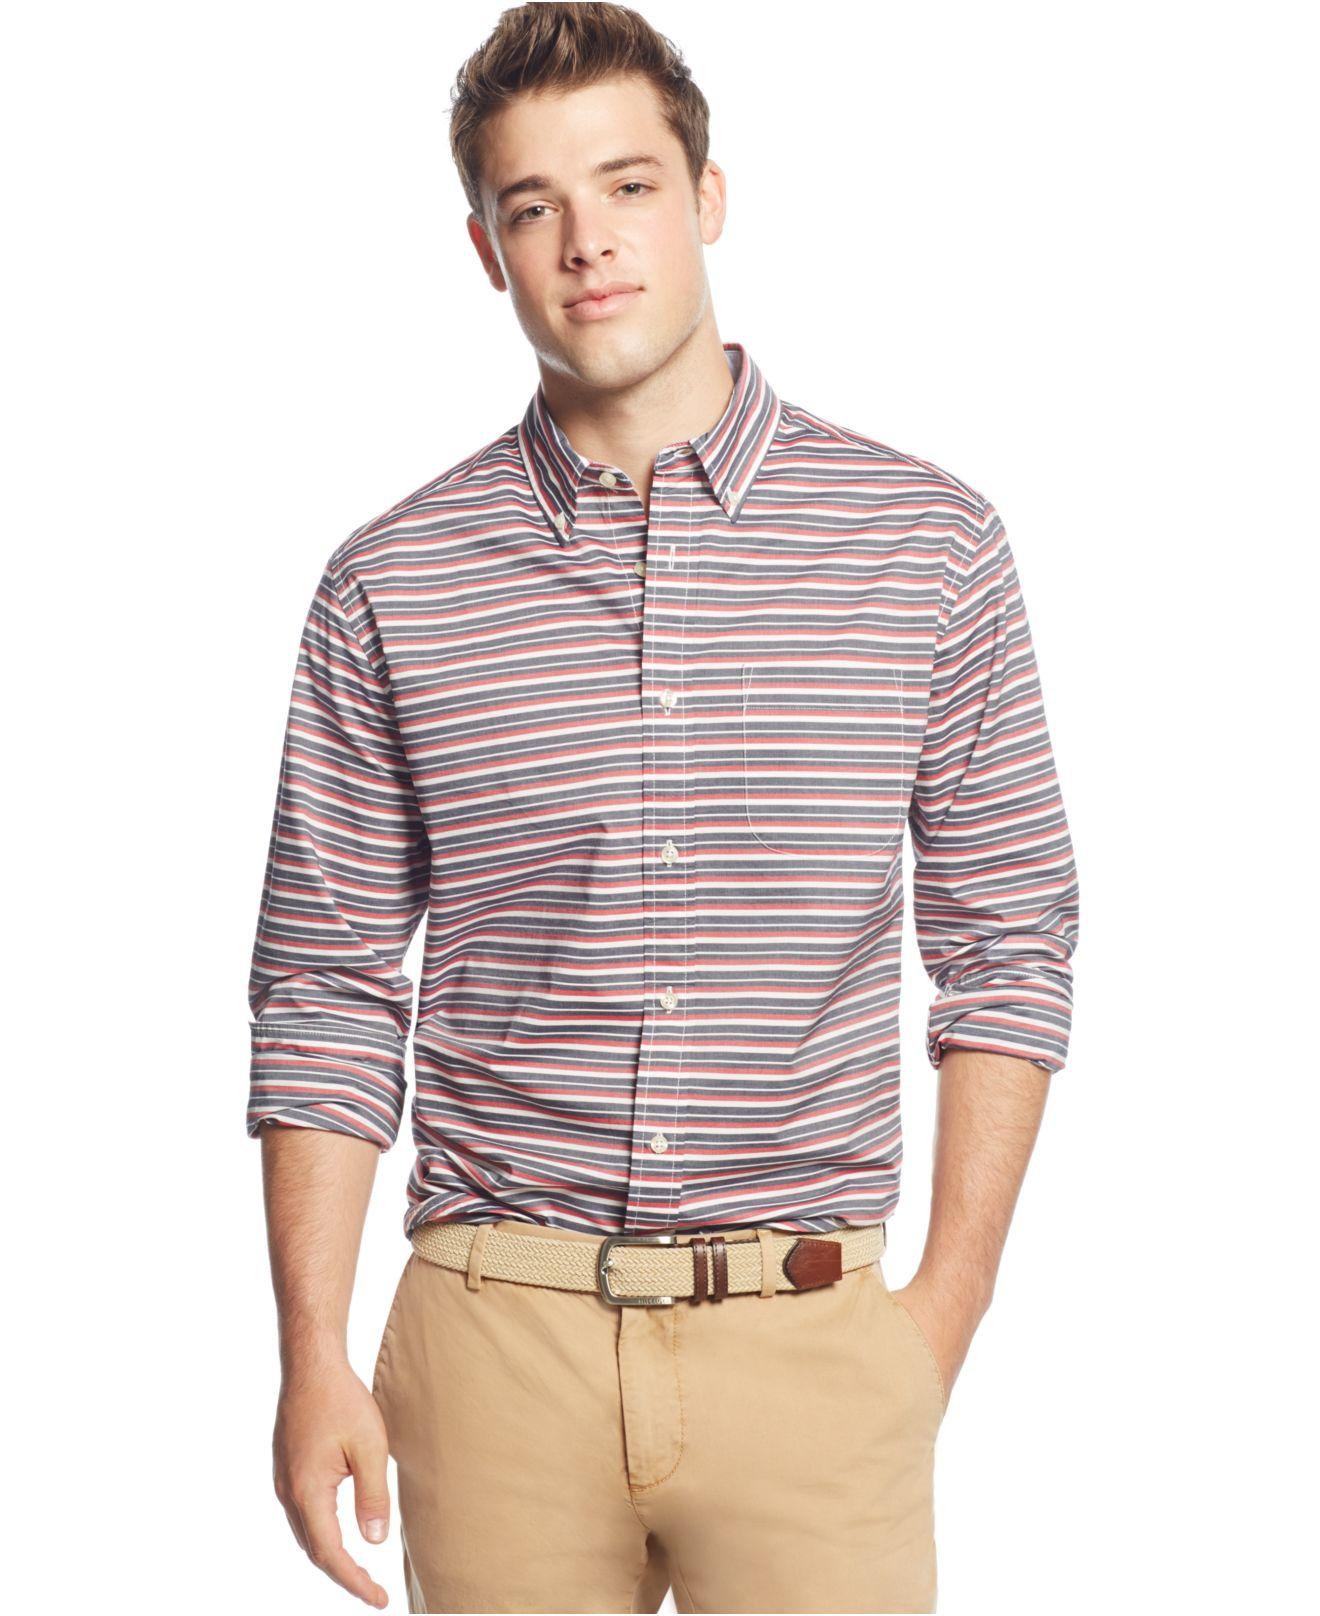 d2316c53 Tommy Hilfiger Active Horizontal Stripe Long-sleeve Button-down ...